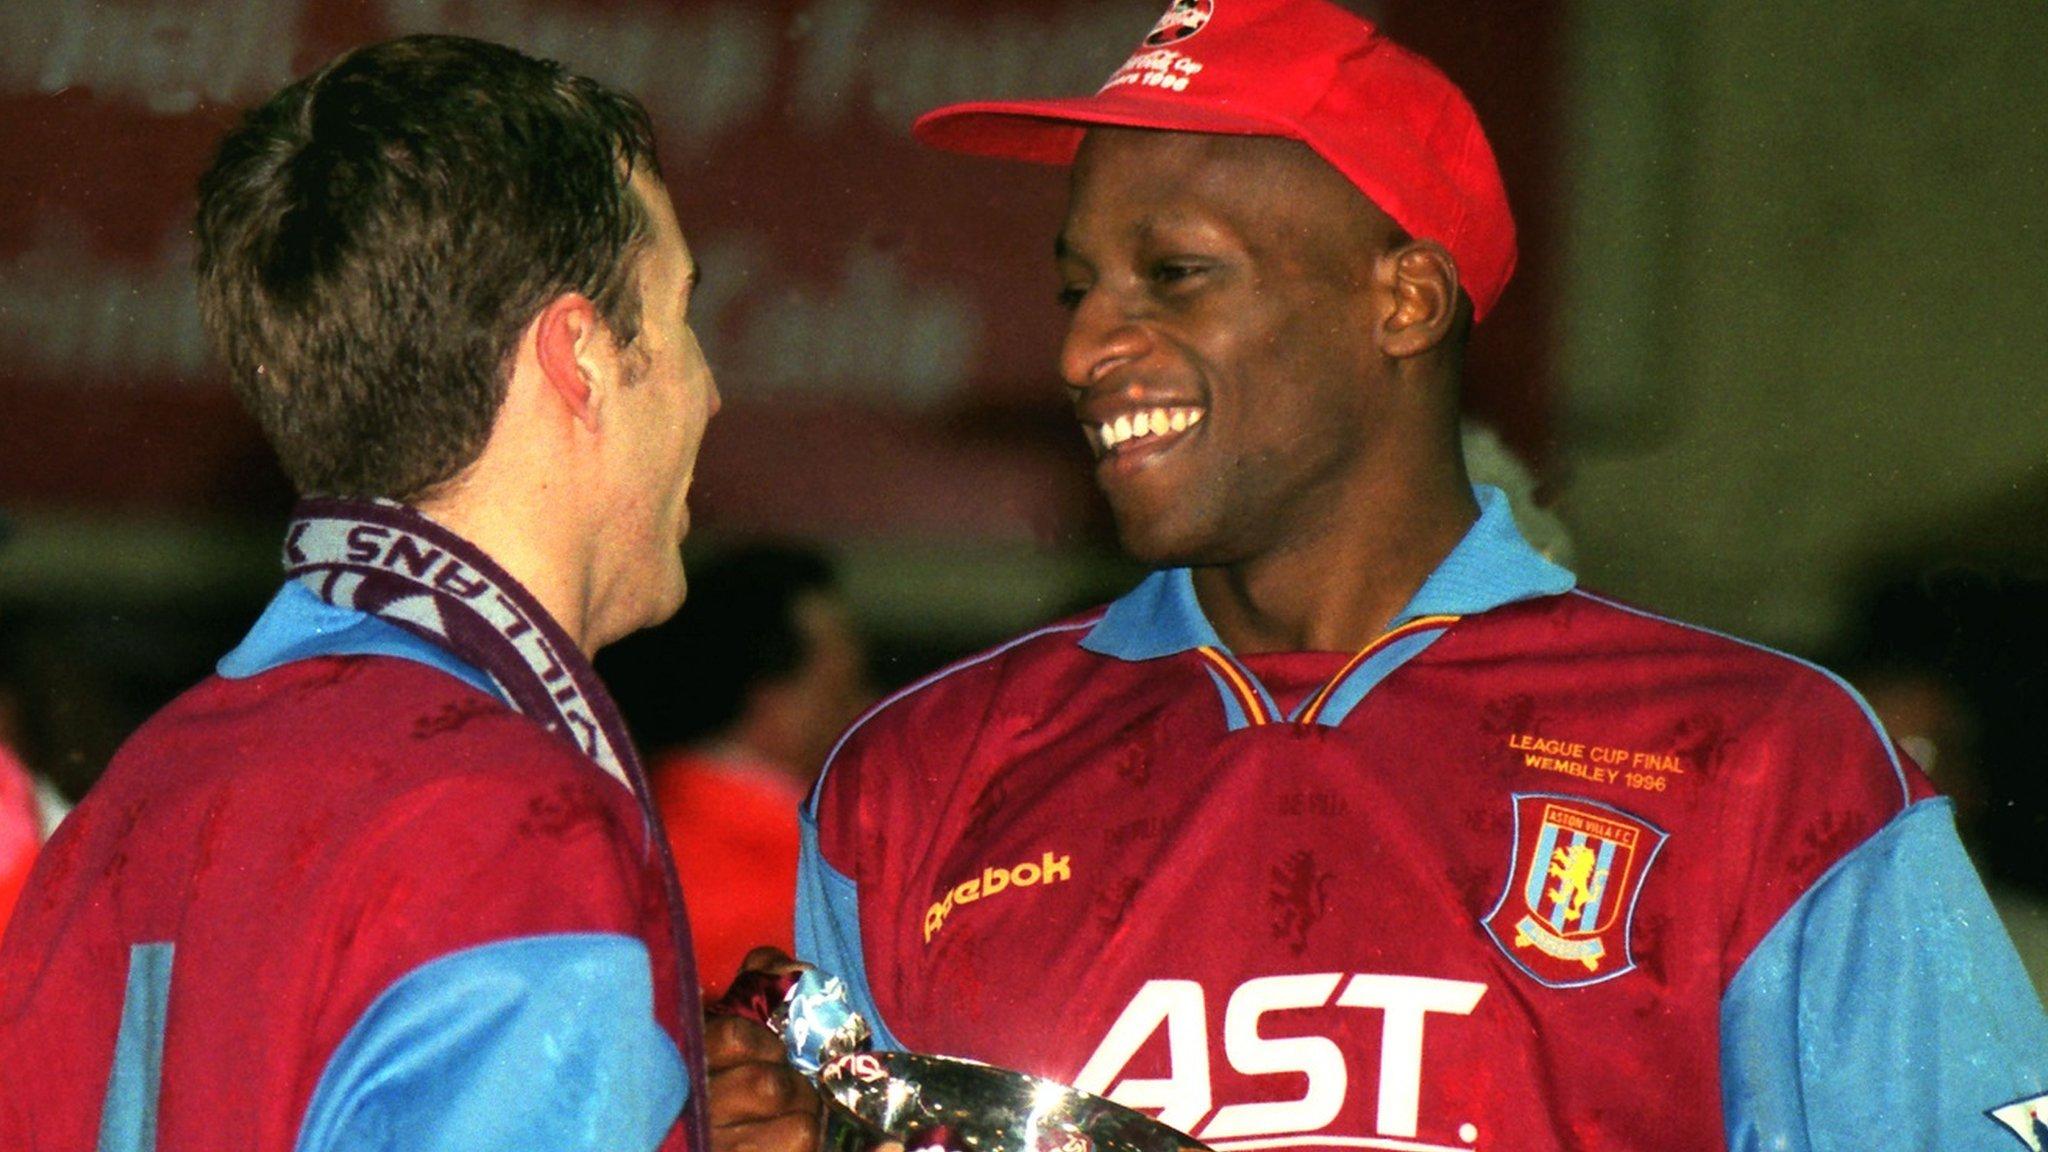 Ugo Ehiogu: England boss Gareth Southgate 'stunned' by death of former team-mate